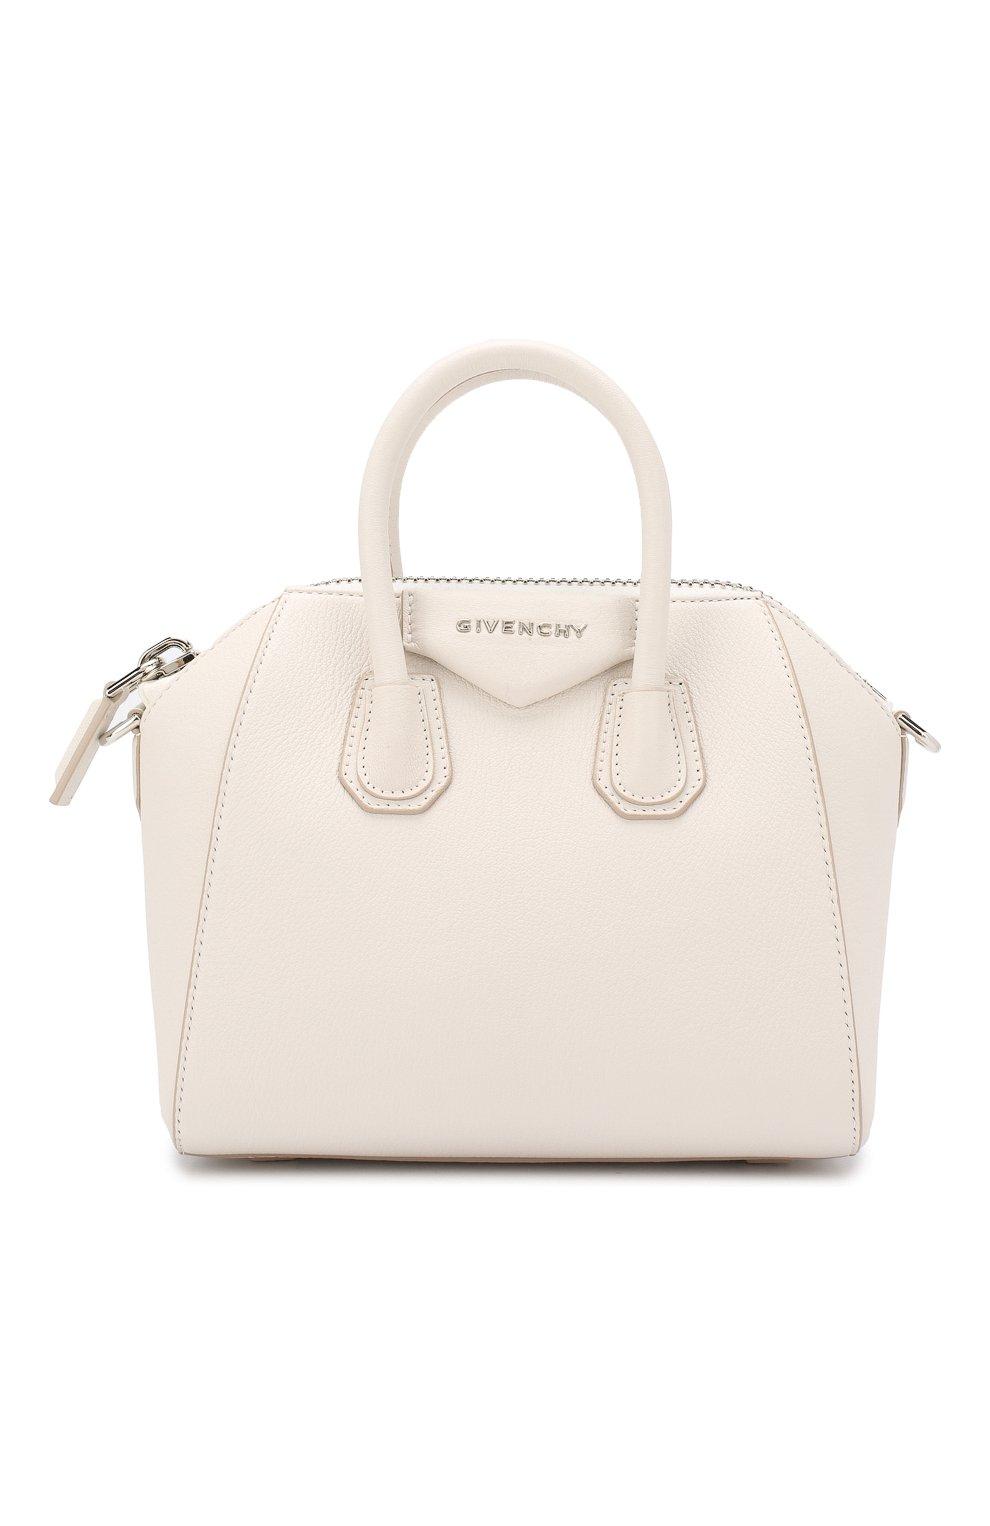 Сумка Antigona mini Givenchy белая цвета | Фото №1